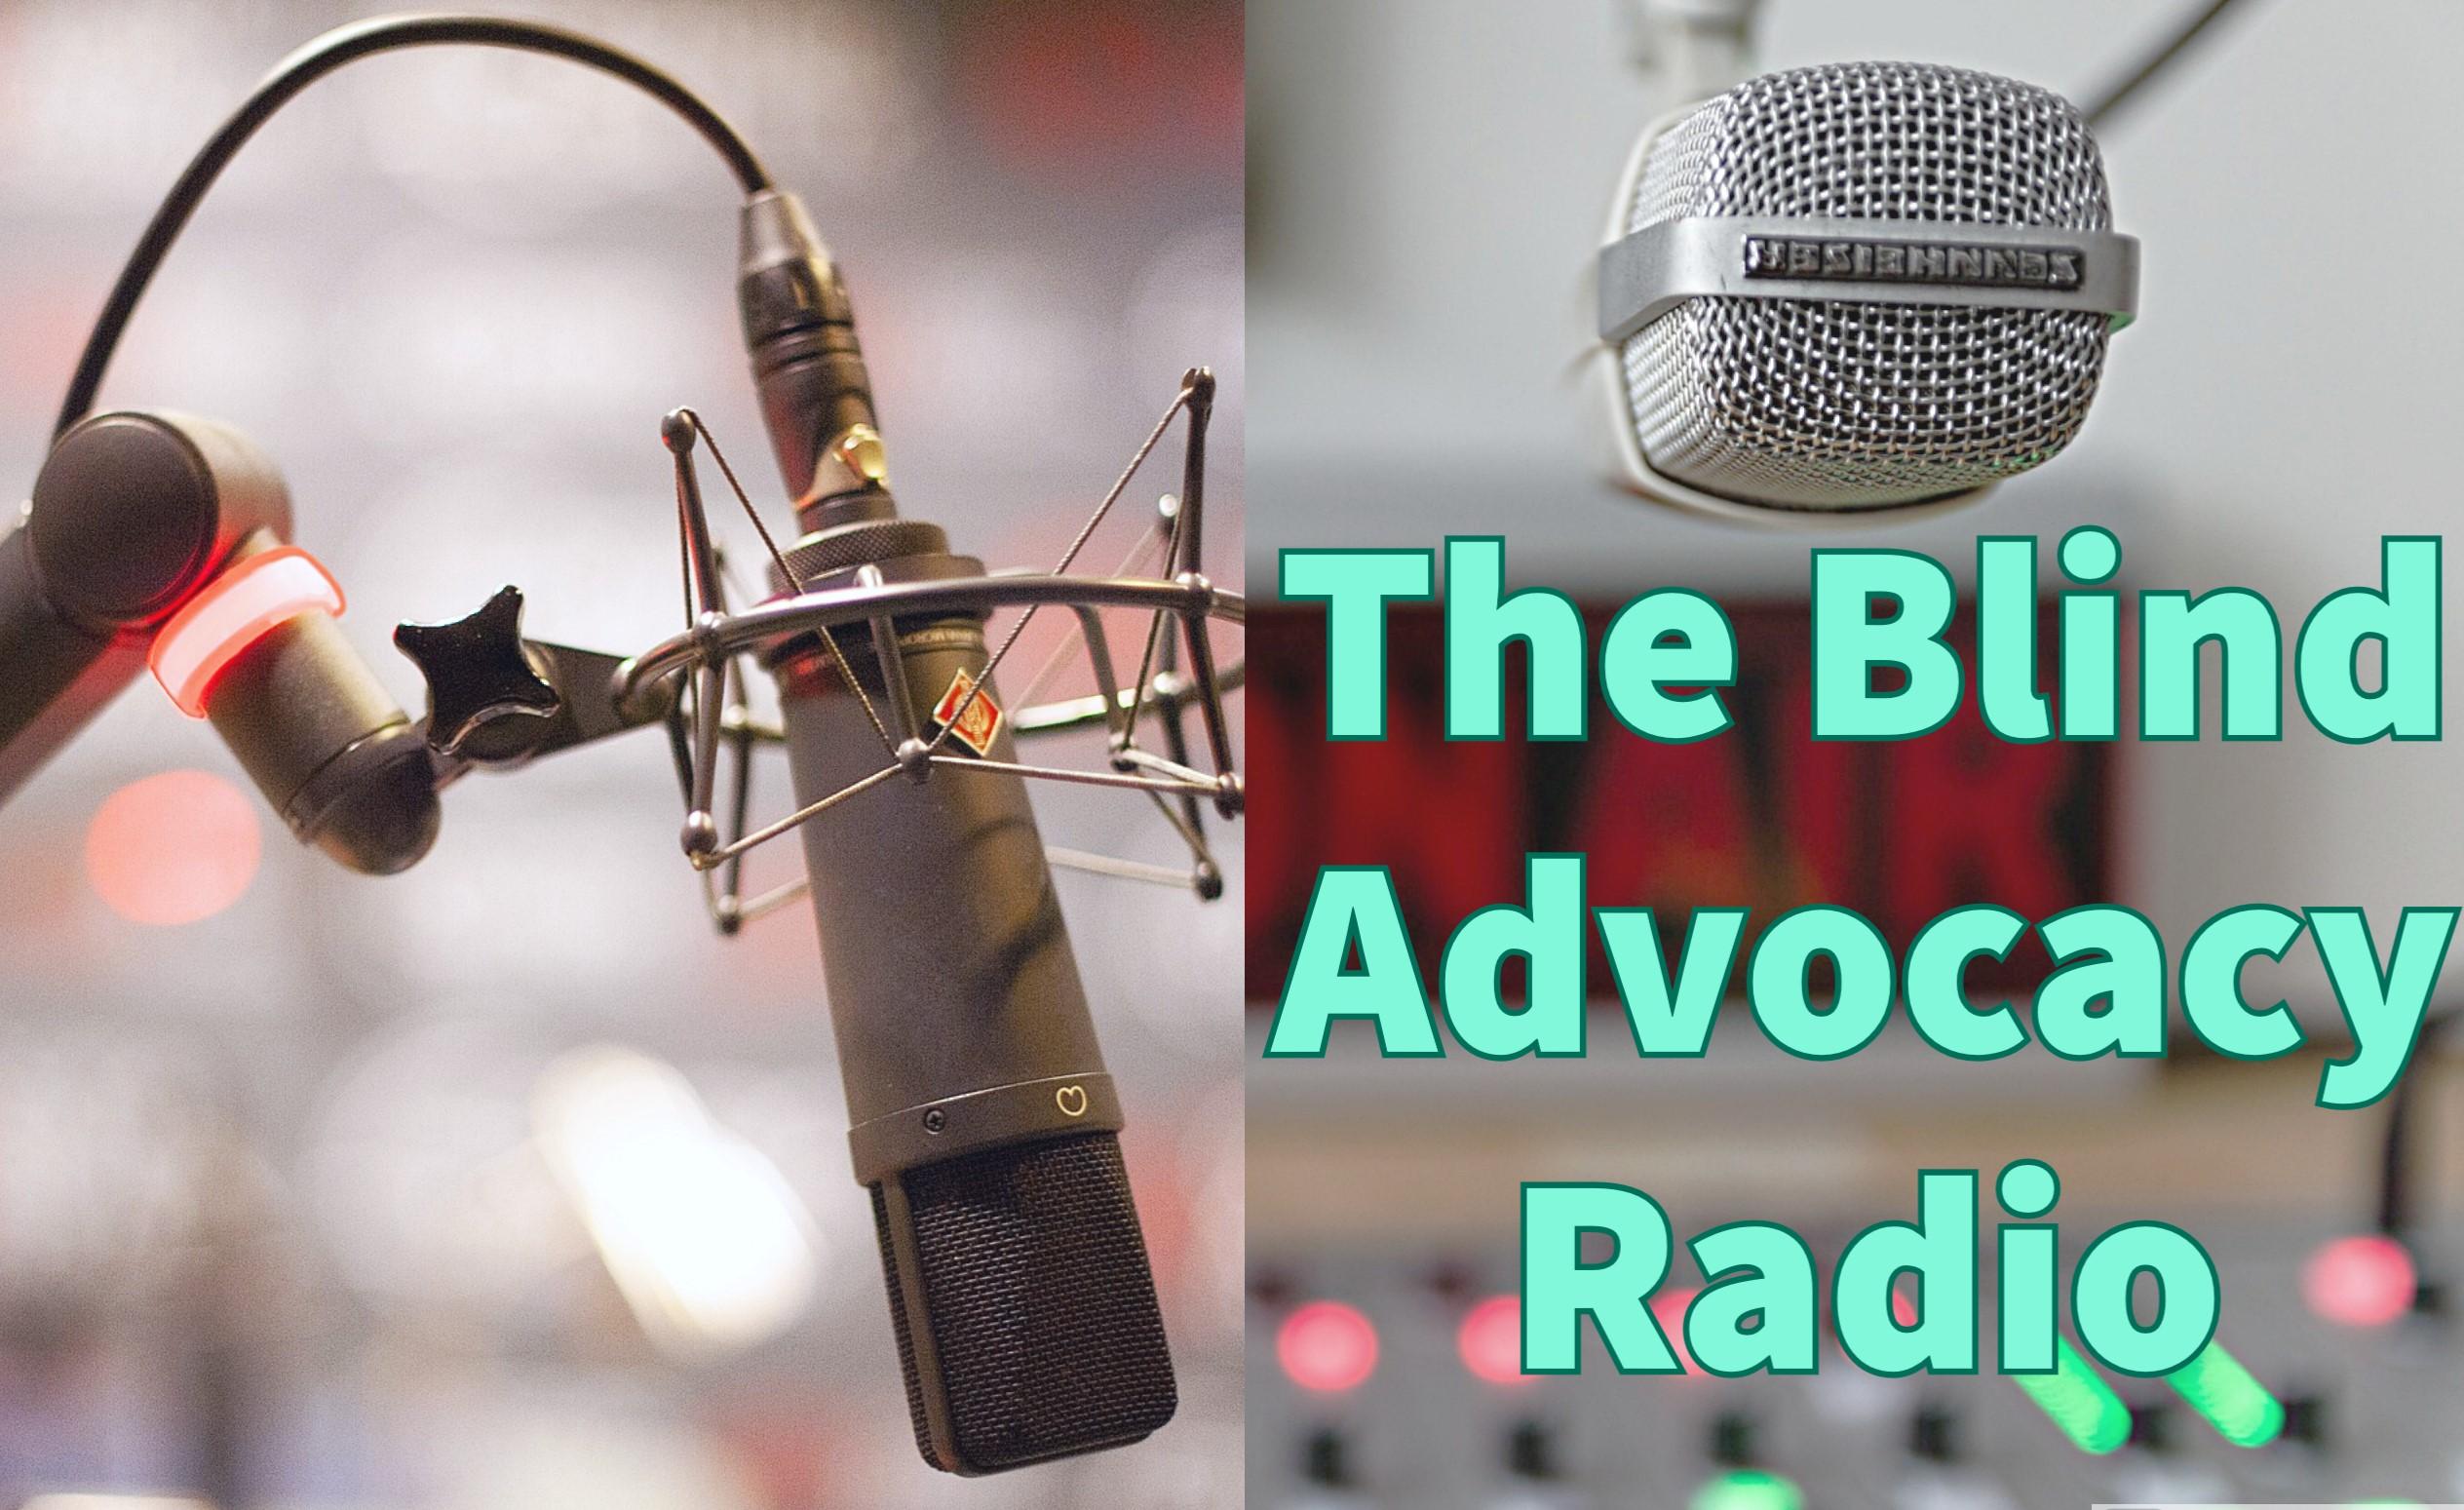 The Blind Advocacy Radio logo